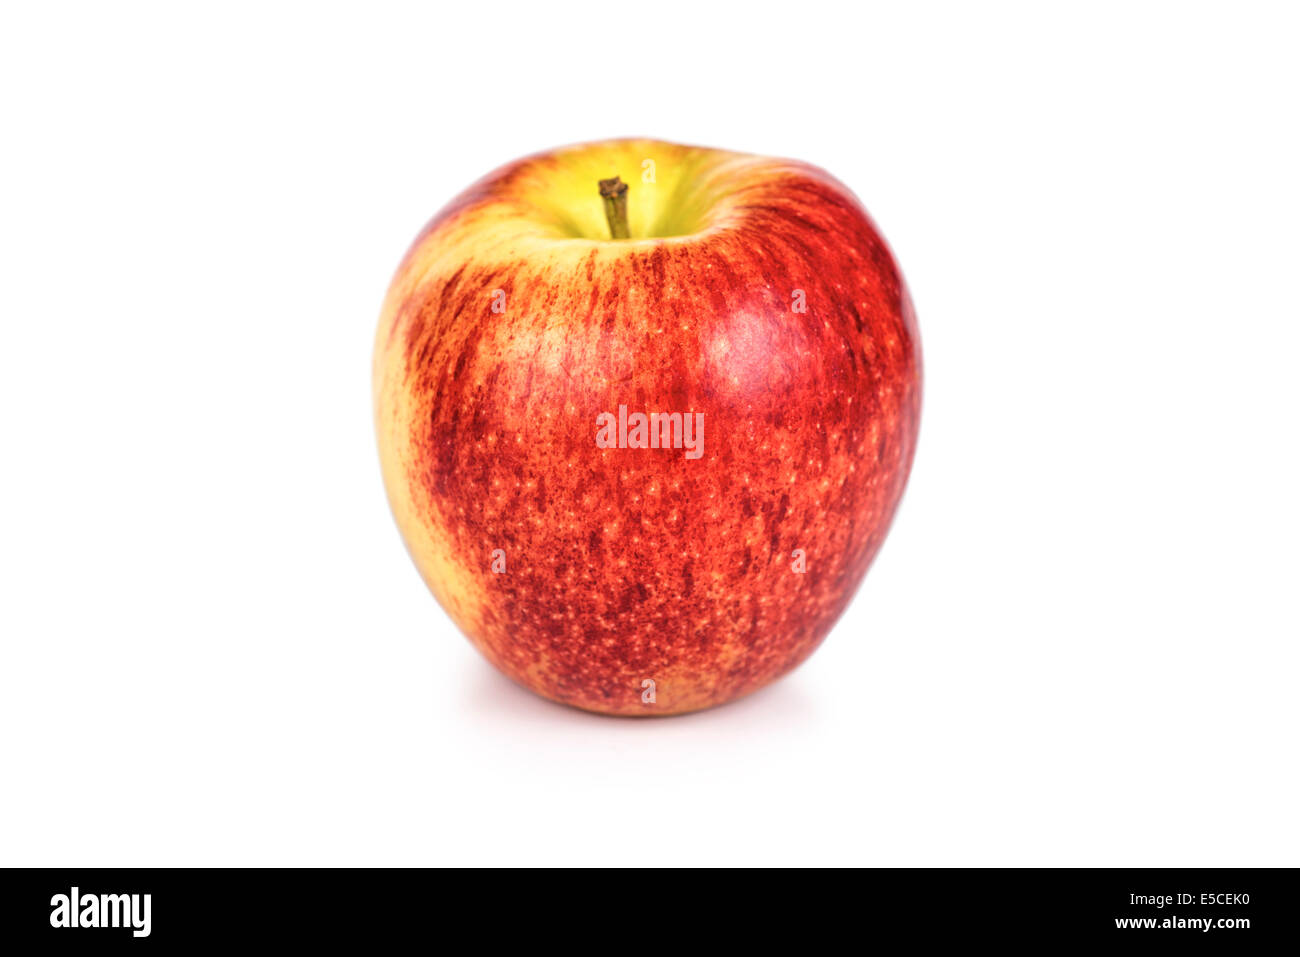 Red Apple, Single Gala Apple - Stock Image